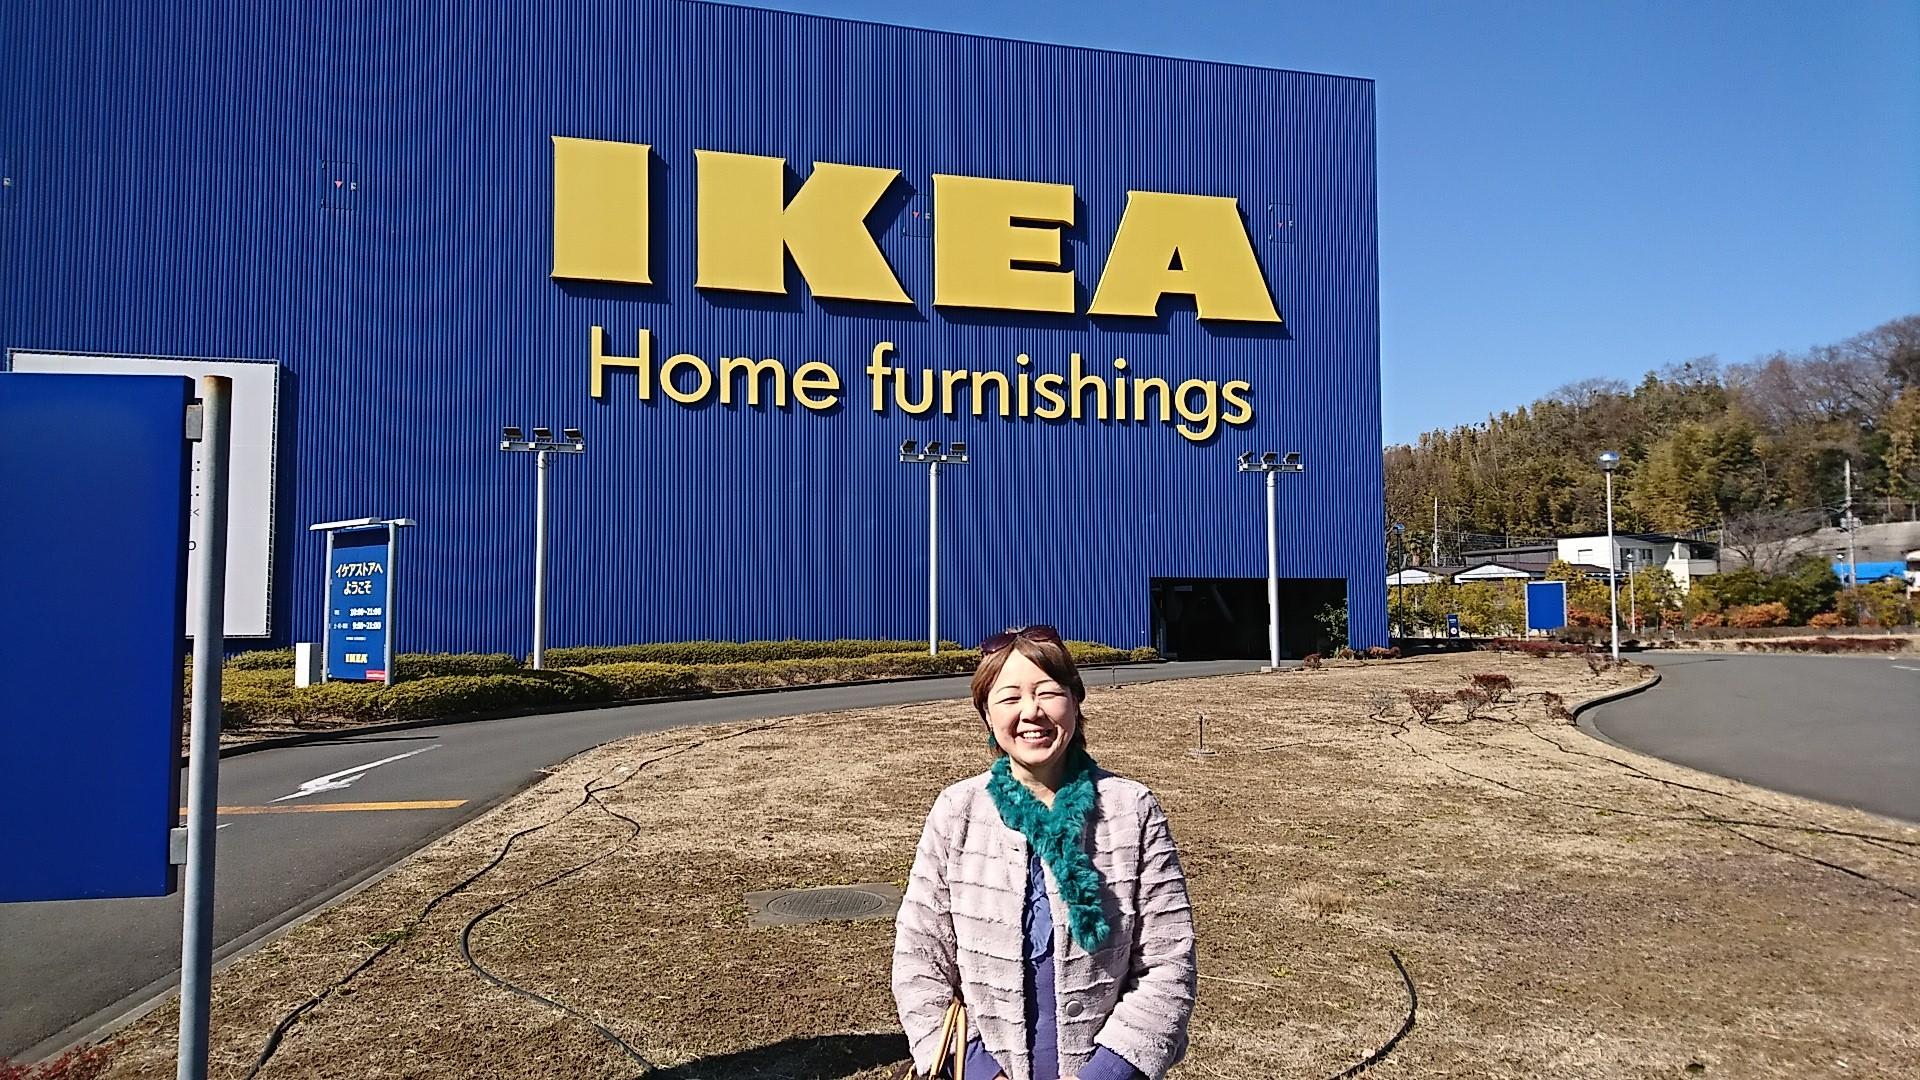 """I went to Ikea yesterday"""